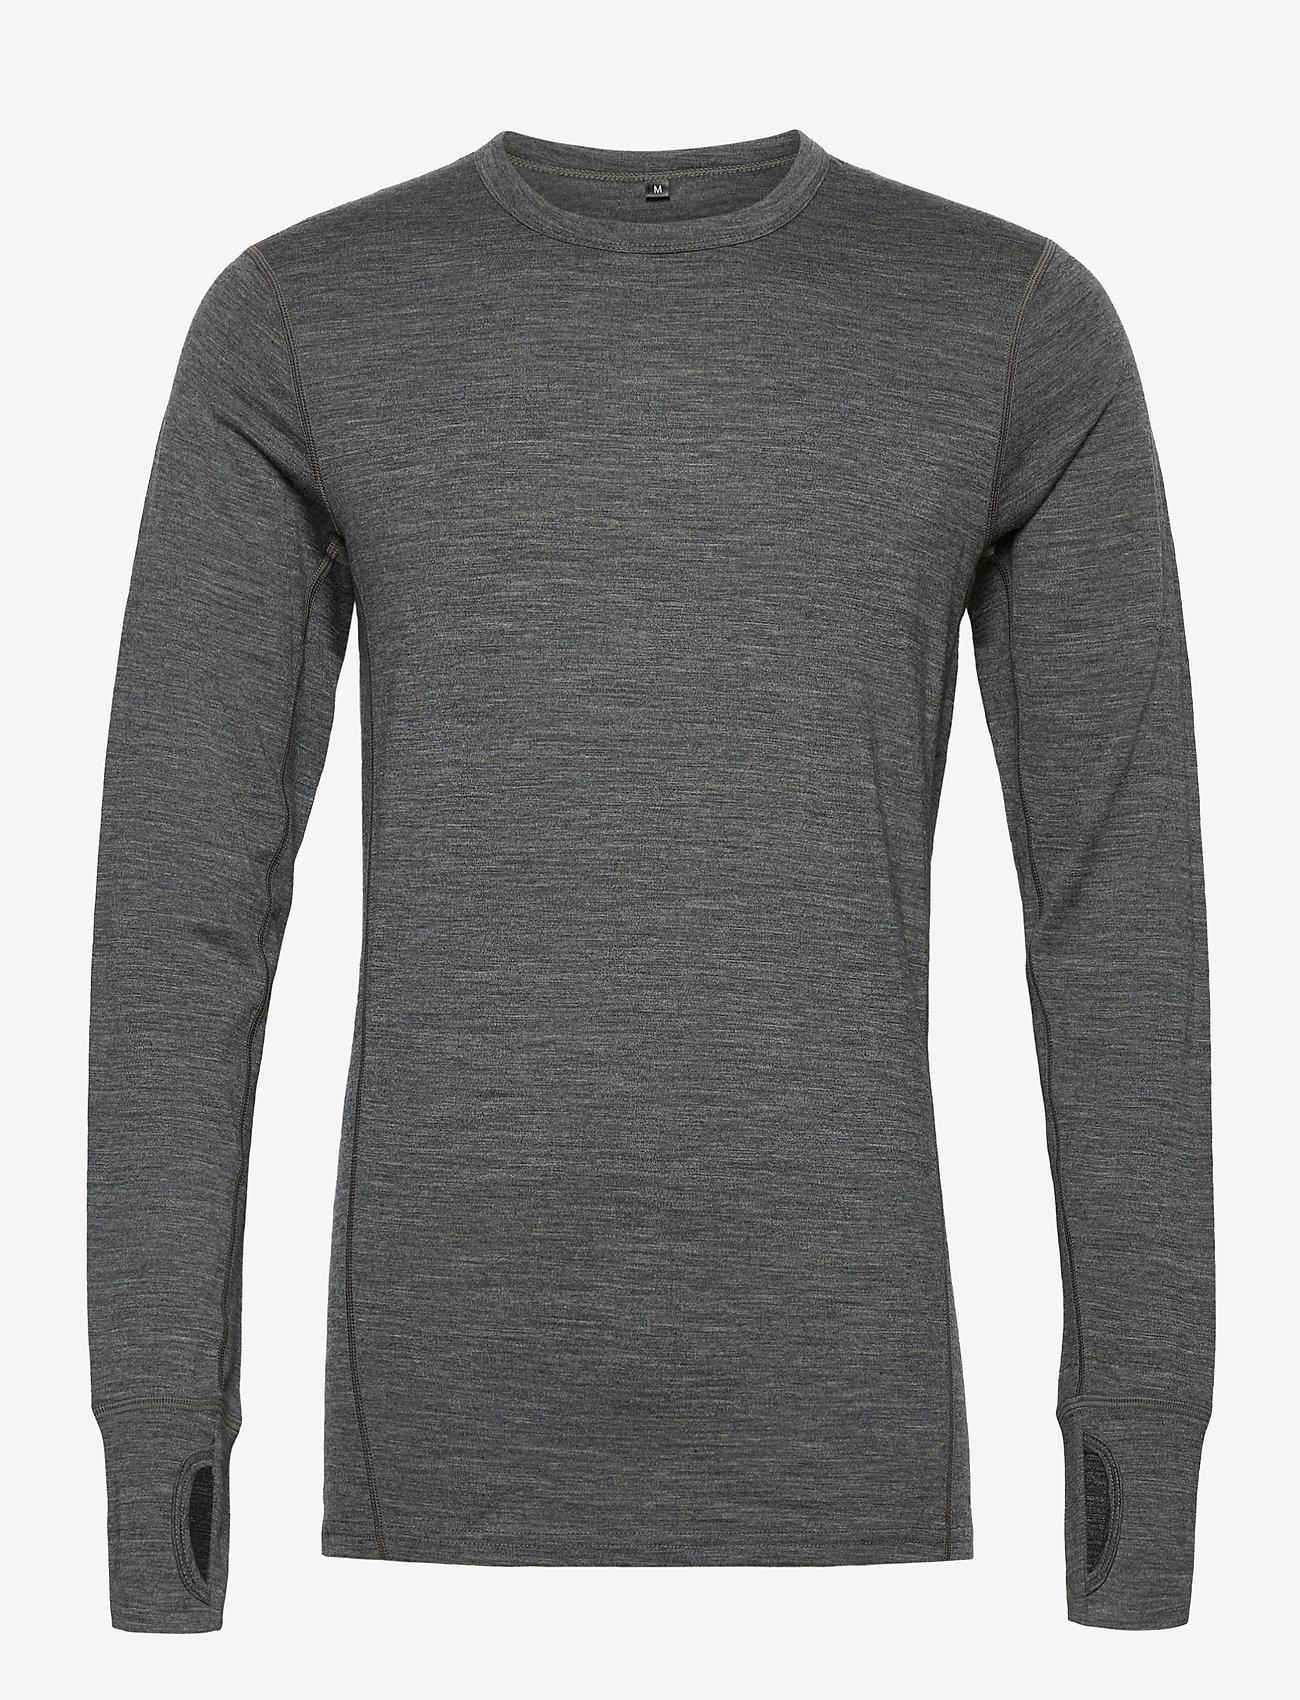 Skogstad - Leknes merino wool sweater - basic strik - mid grey melange - 0